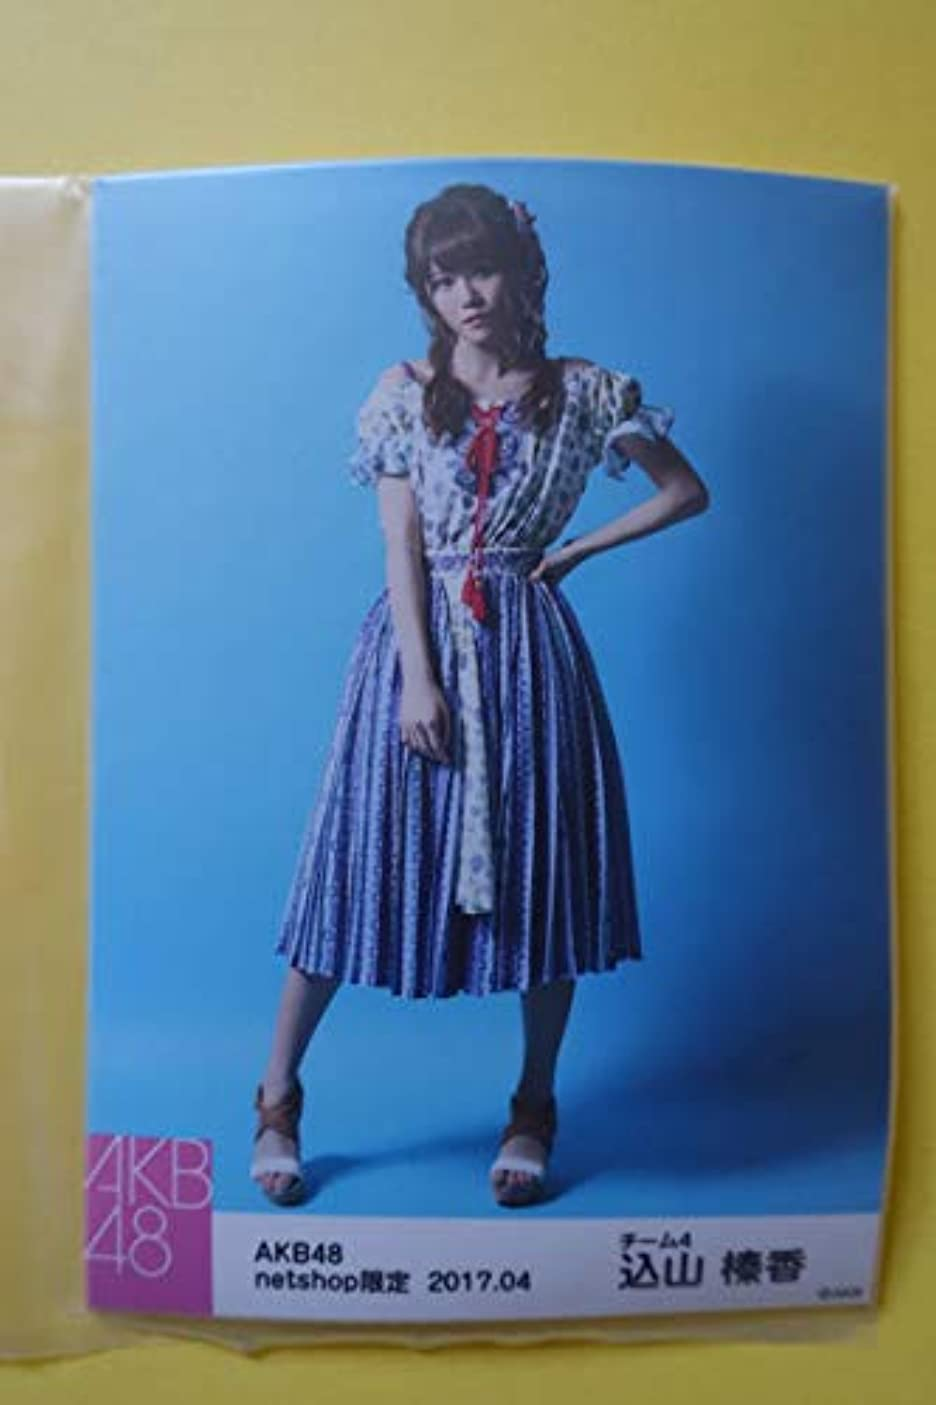 球状落ち着く製作AKB48 個別生写真5枚セット 2017.04 山榛香